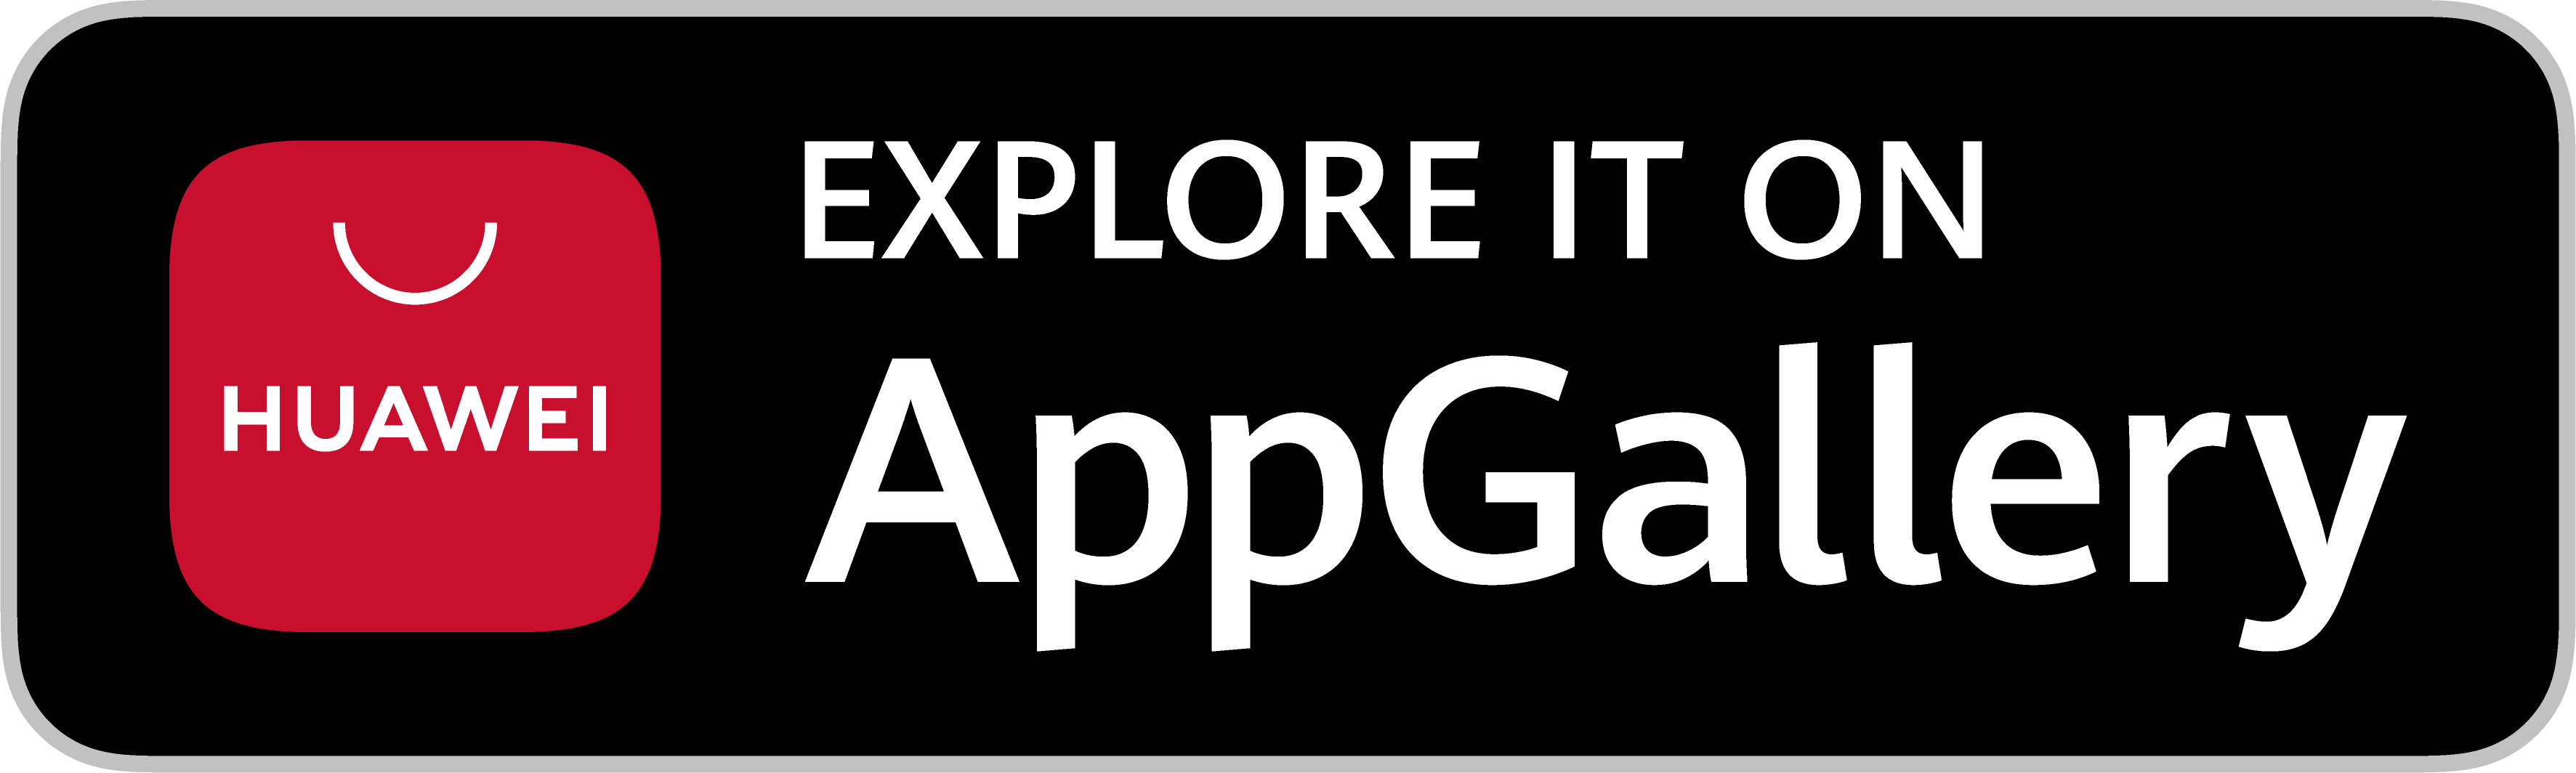 huawei app icon